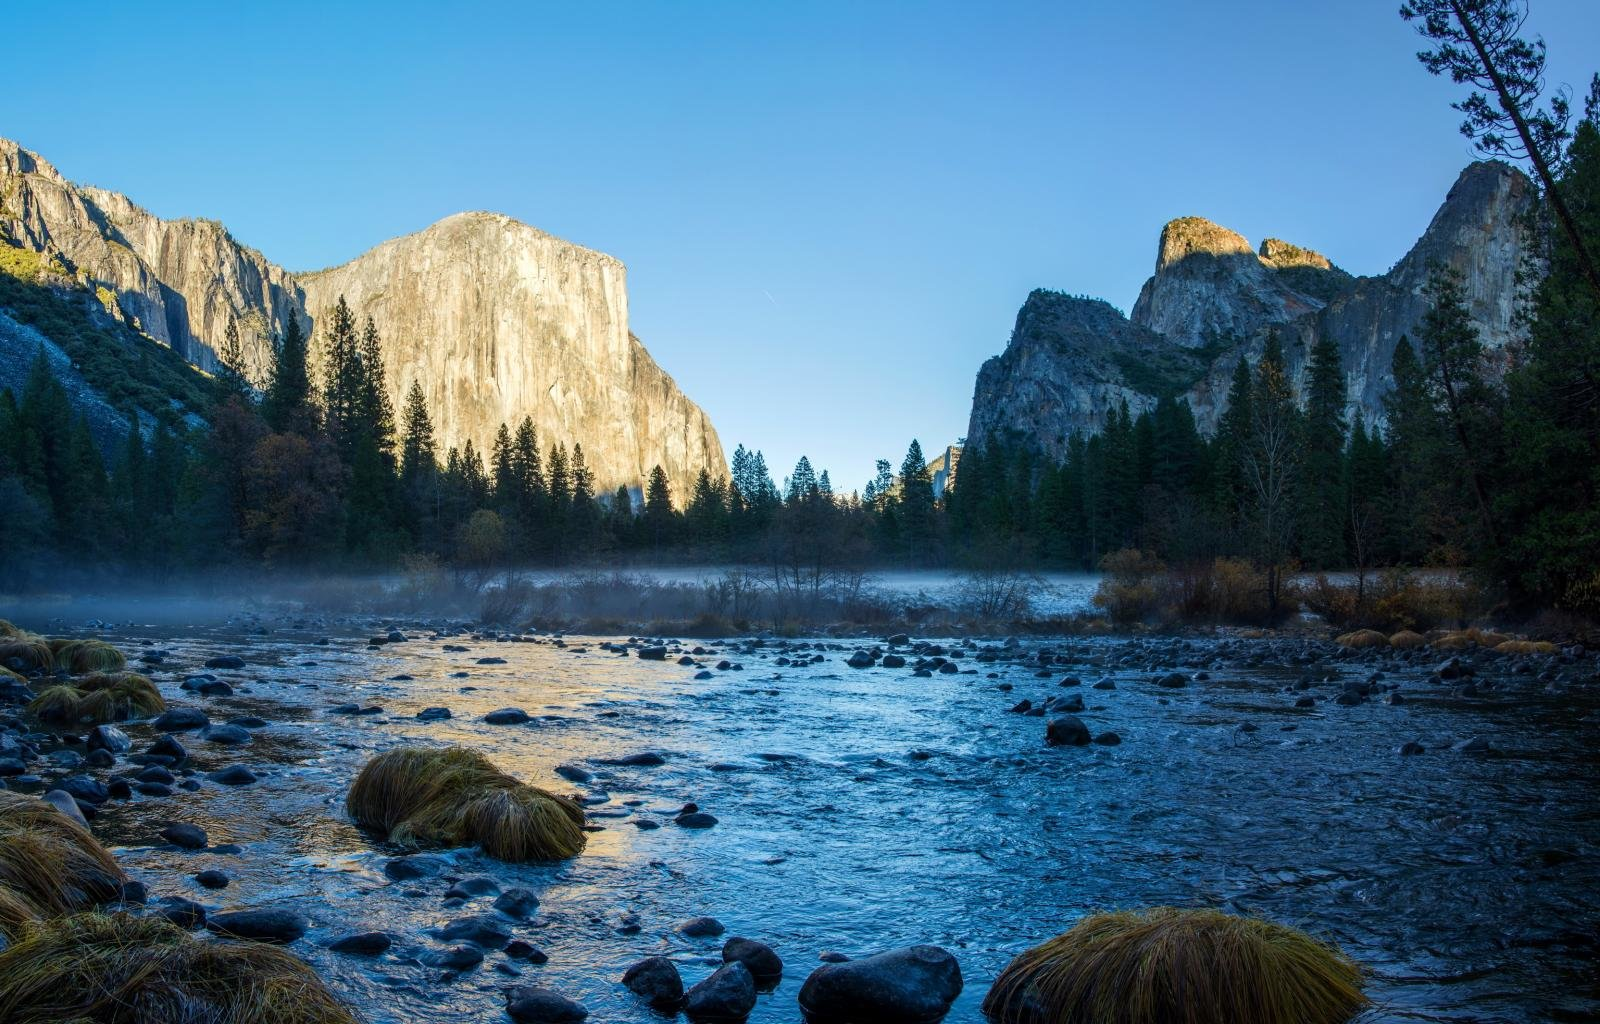 Yosemite national park wallpapers hd for desktop backgrounds - Wallpaper 1600x1024 ...